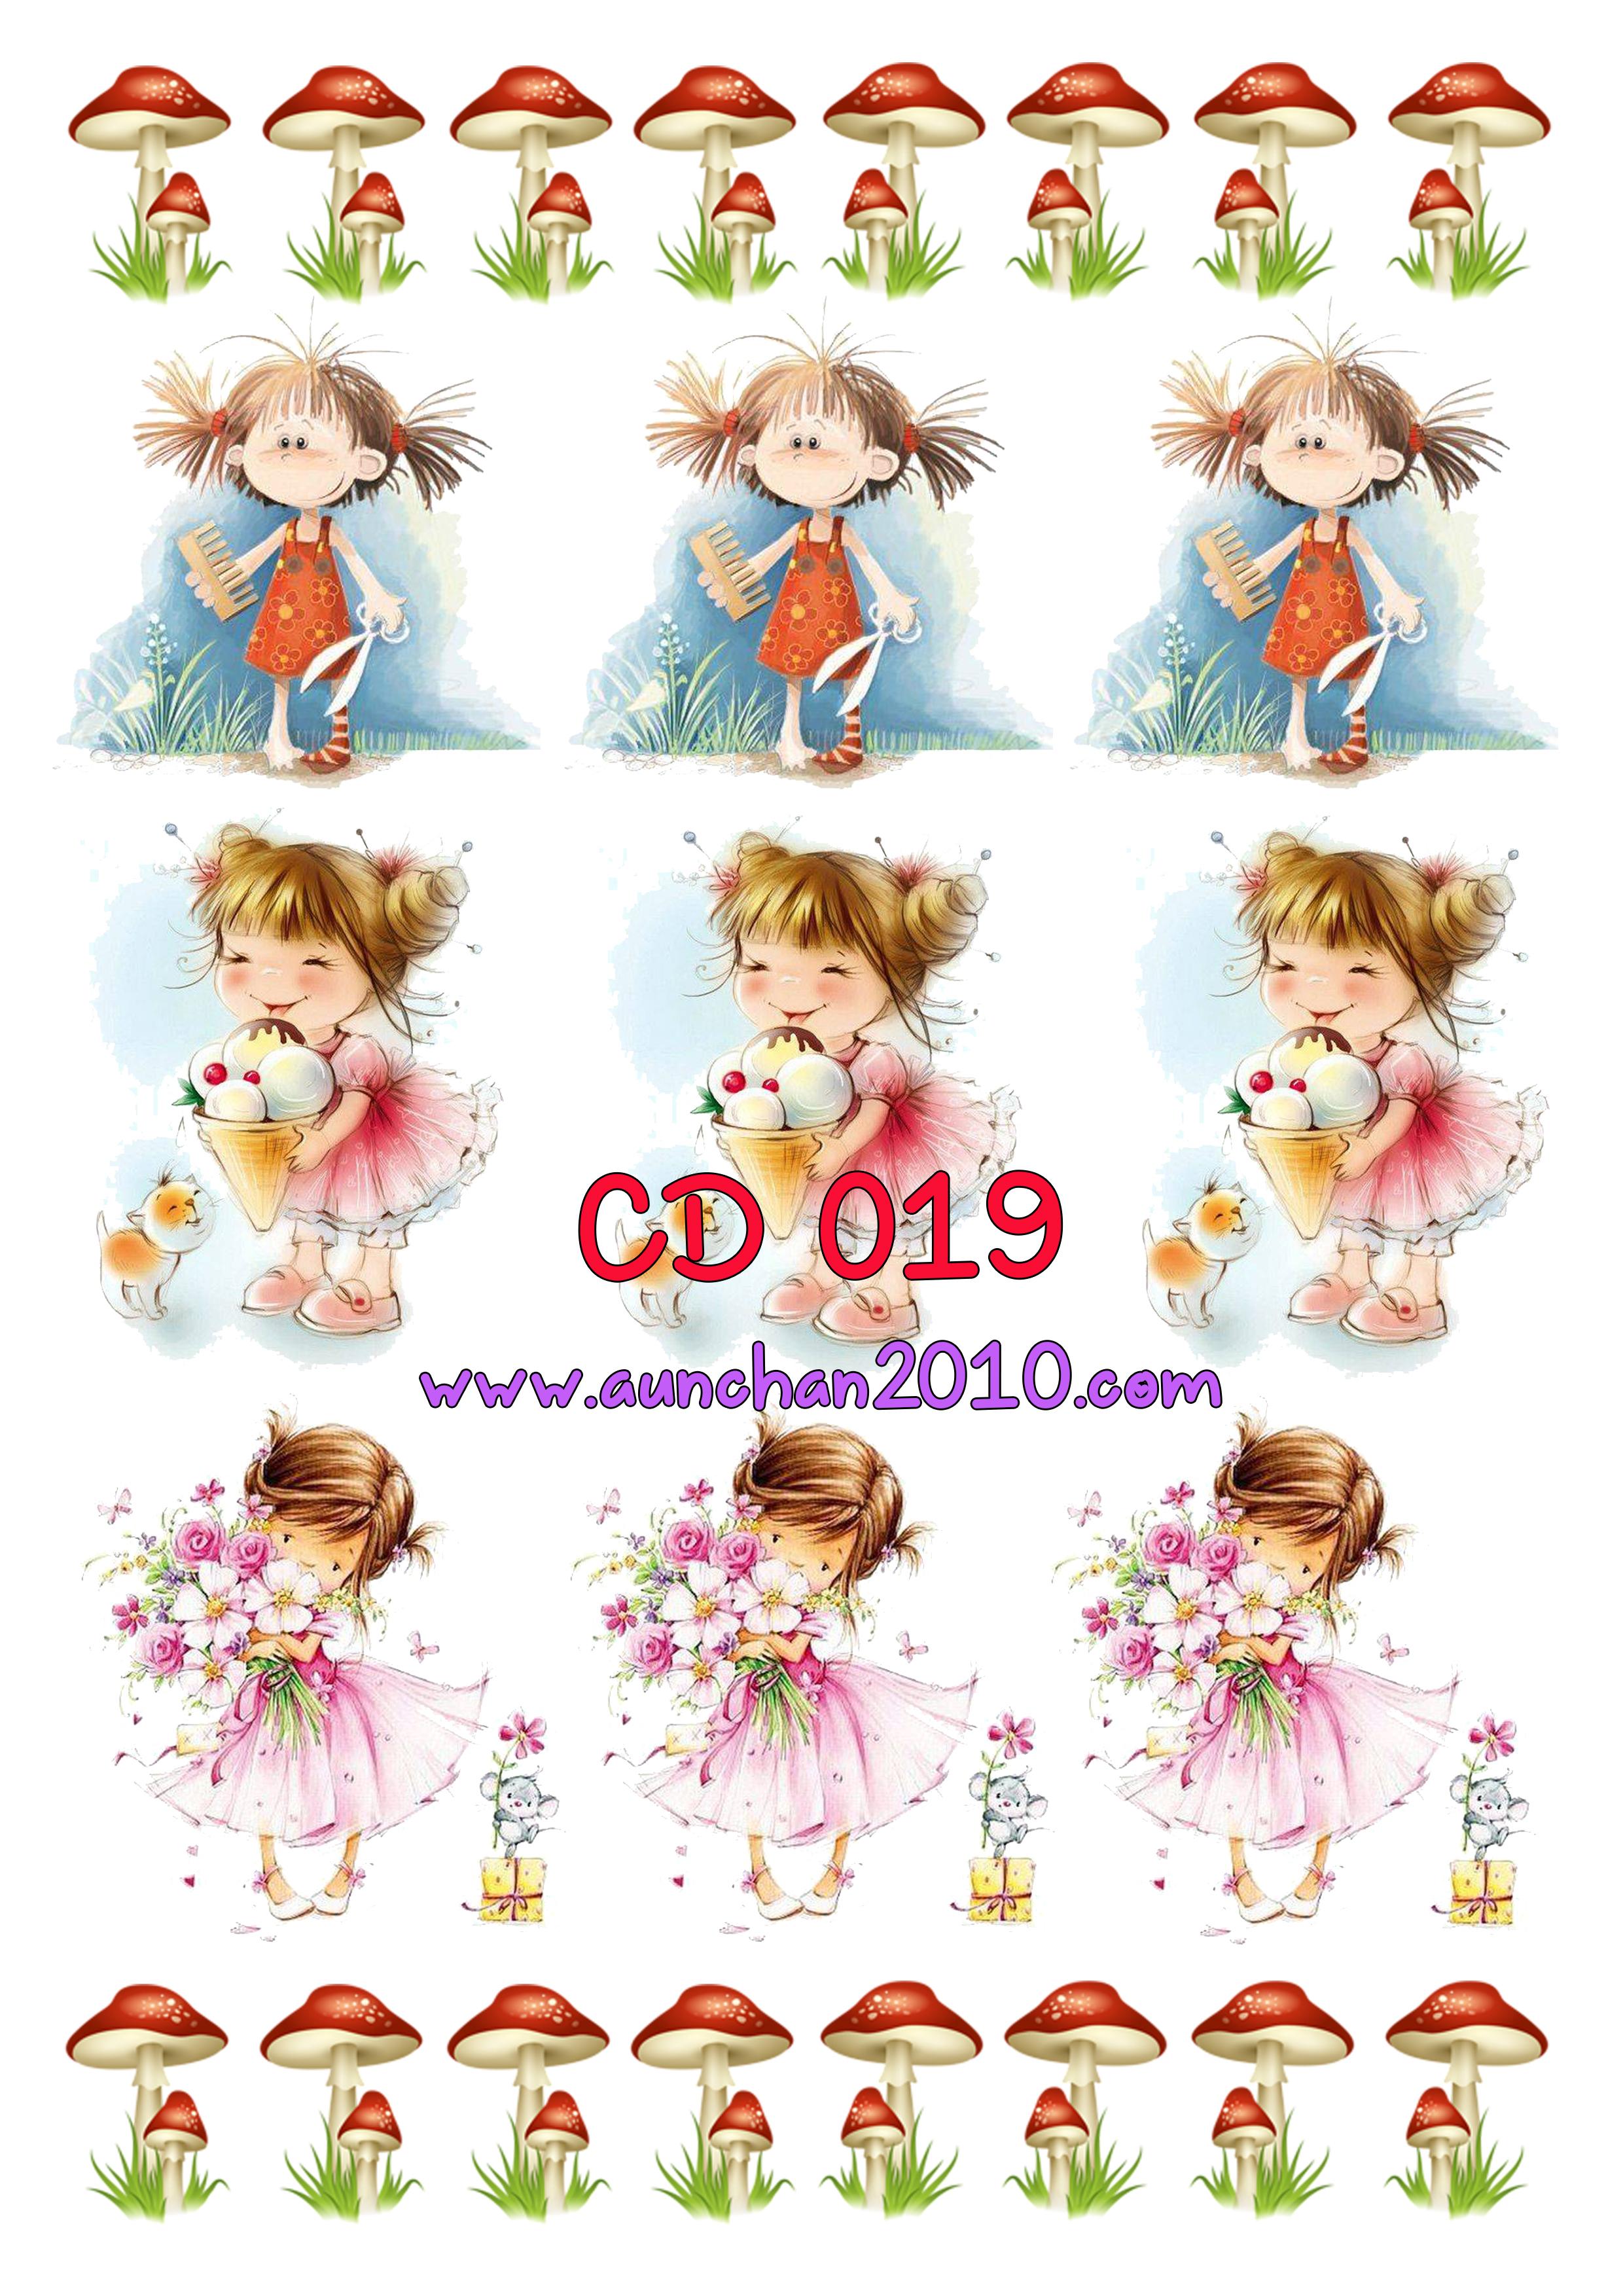 CD019 กระดาษแนพกิ้น 21x30ซม. ลายเด็ก